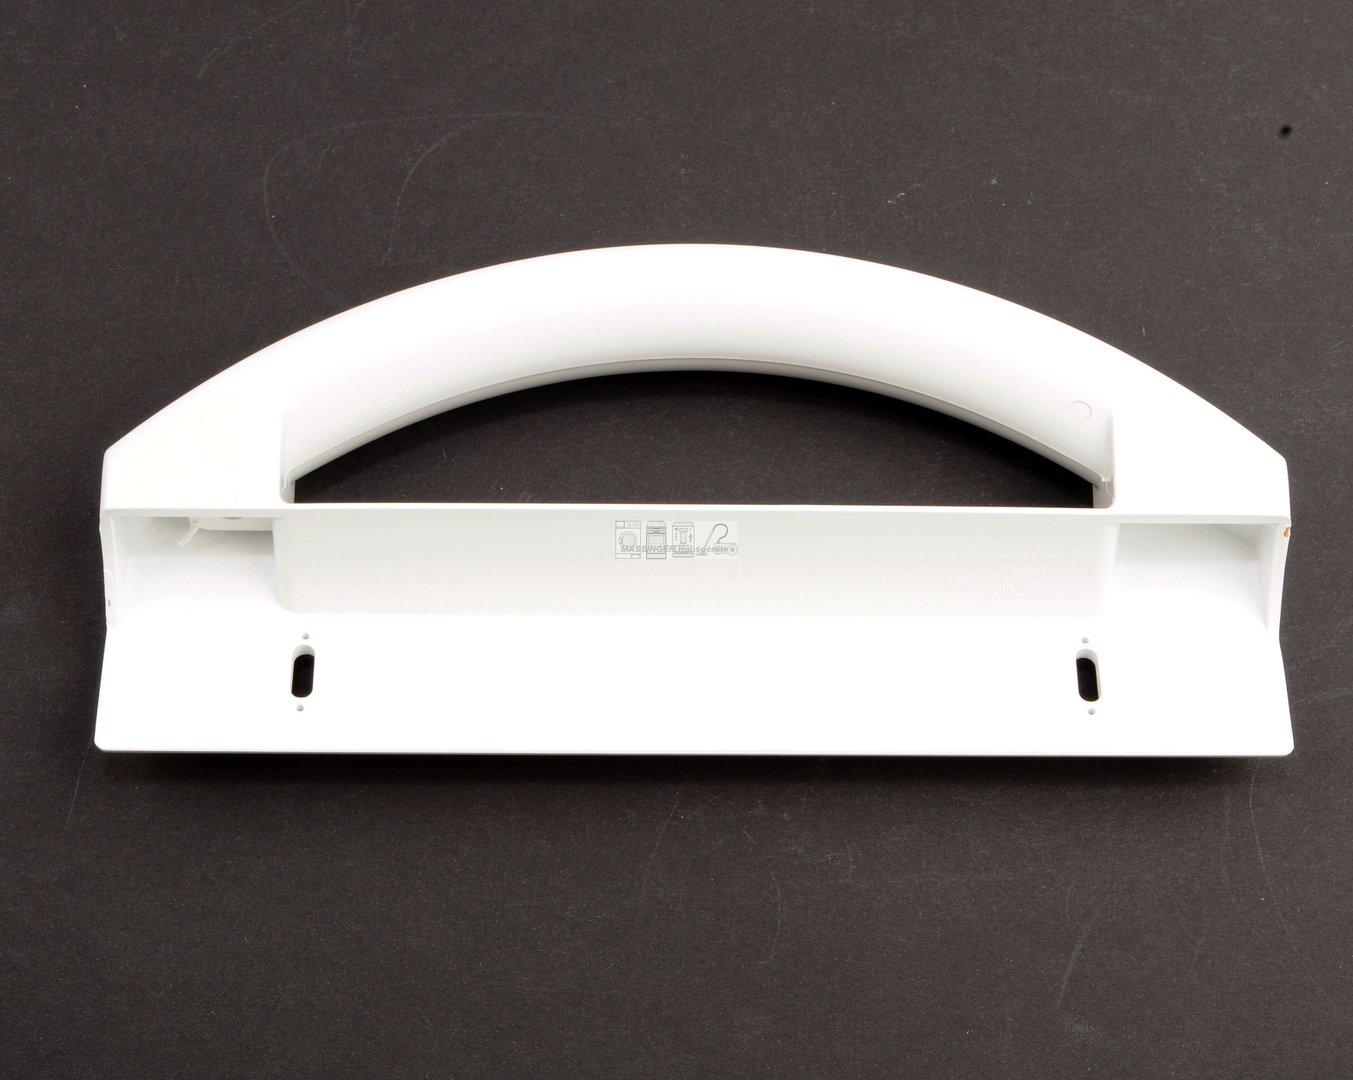 Kühlschrankgriff : Aeg electrolux zanussi kühlschrankgriff weiß gefrierschrankgriff